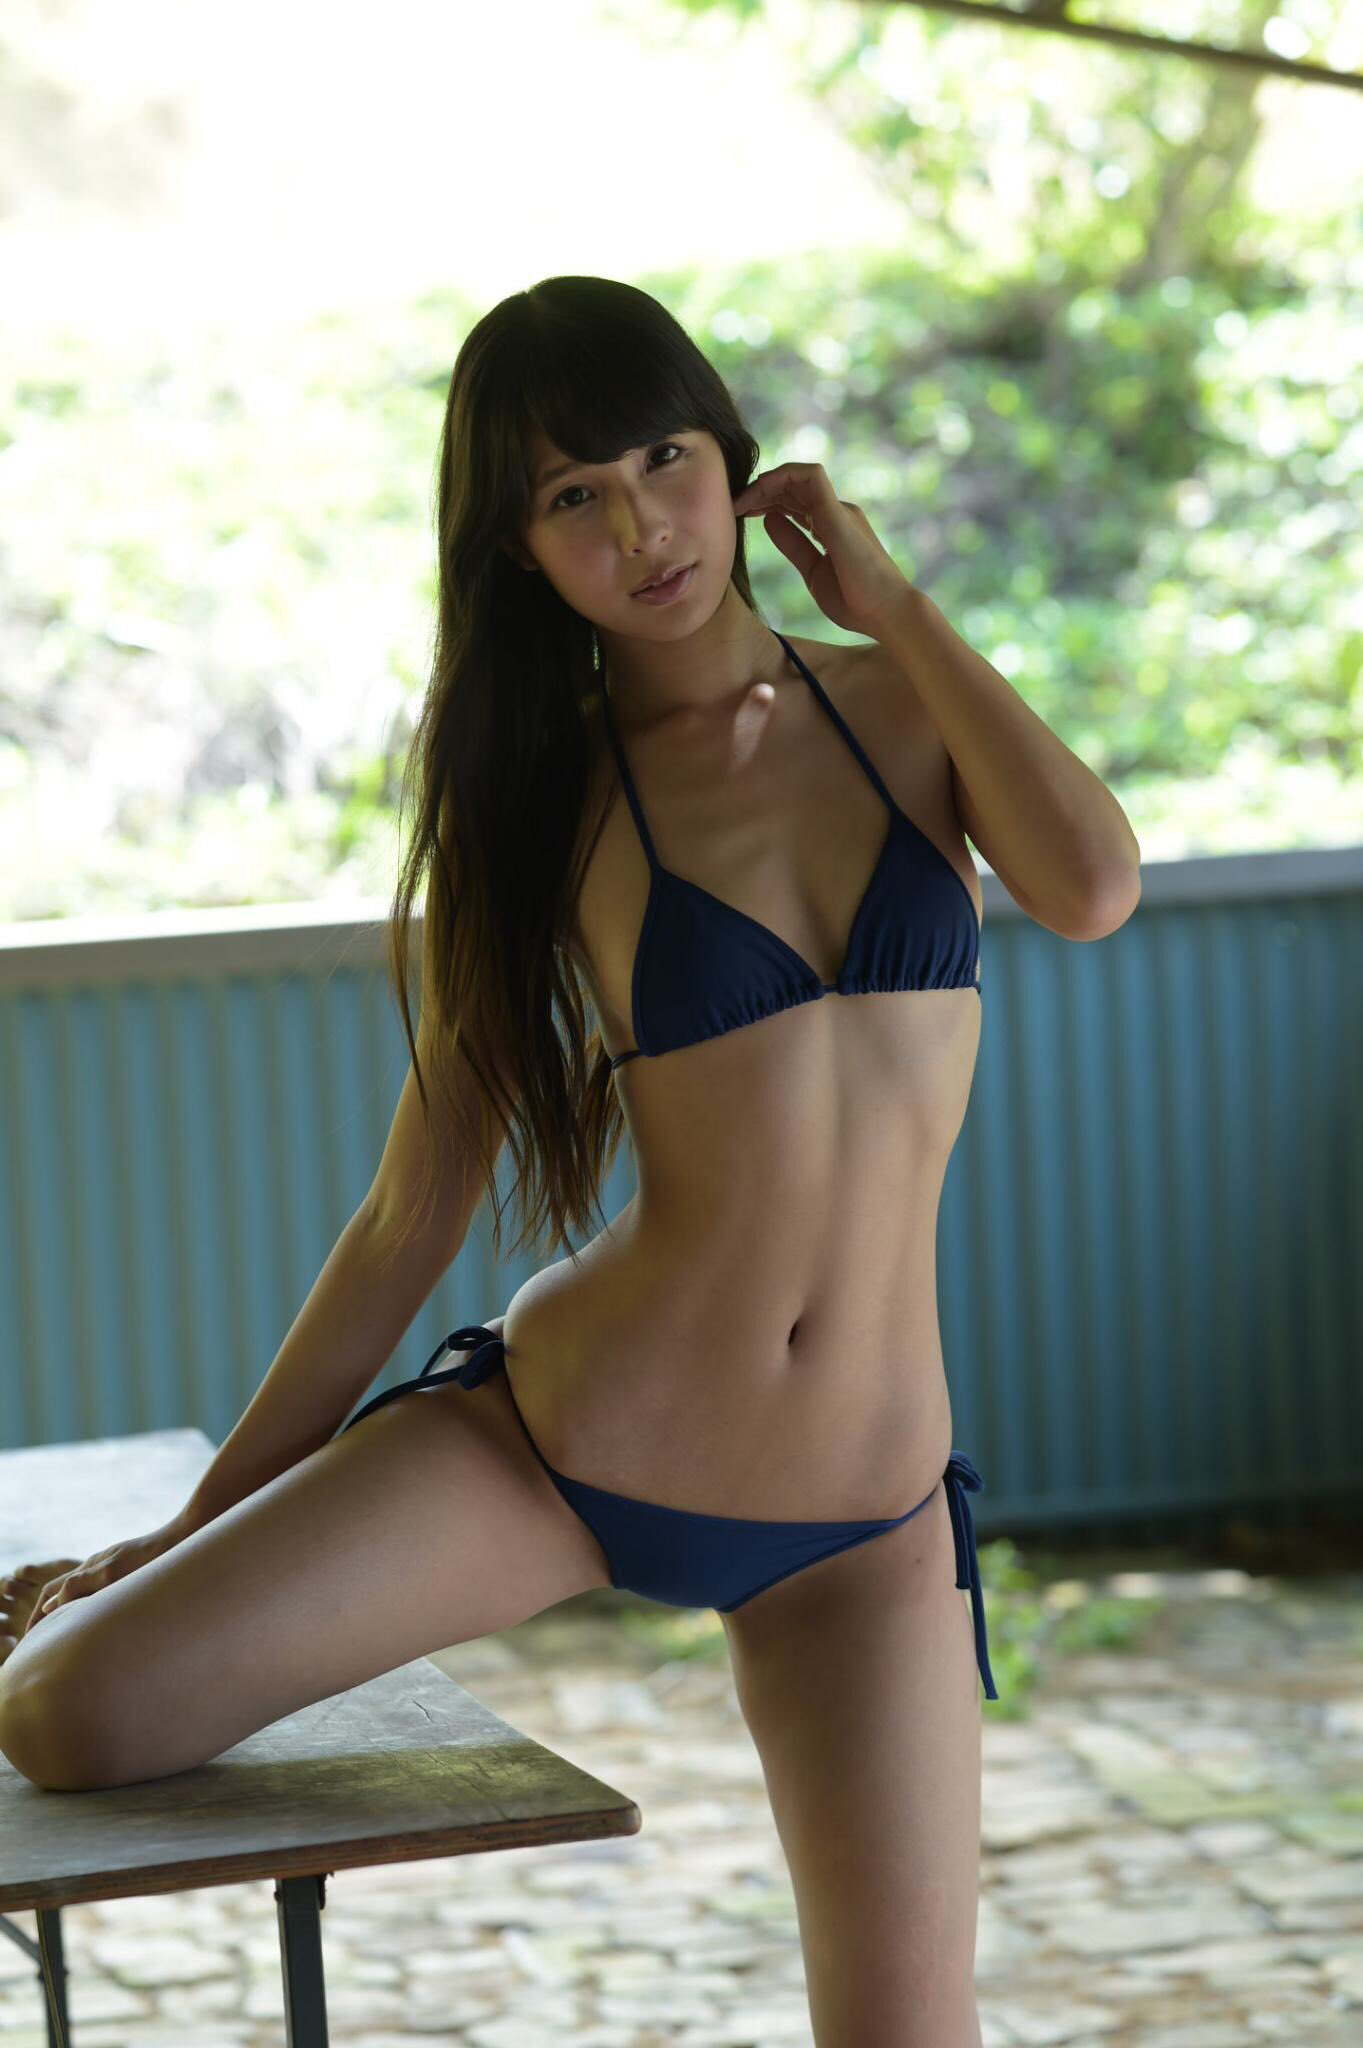 Aya Kawasaki Blue Lingerie, Japanese Rope, Cute Girls, Asian Girl, Blog,